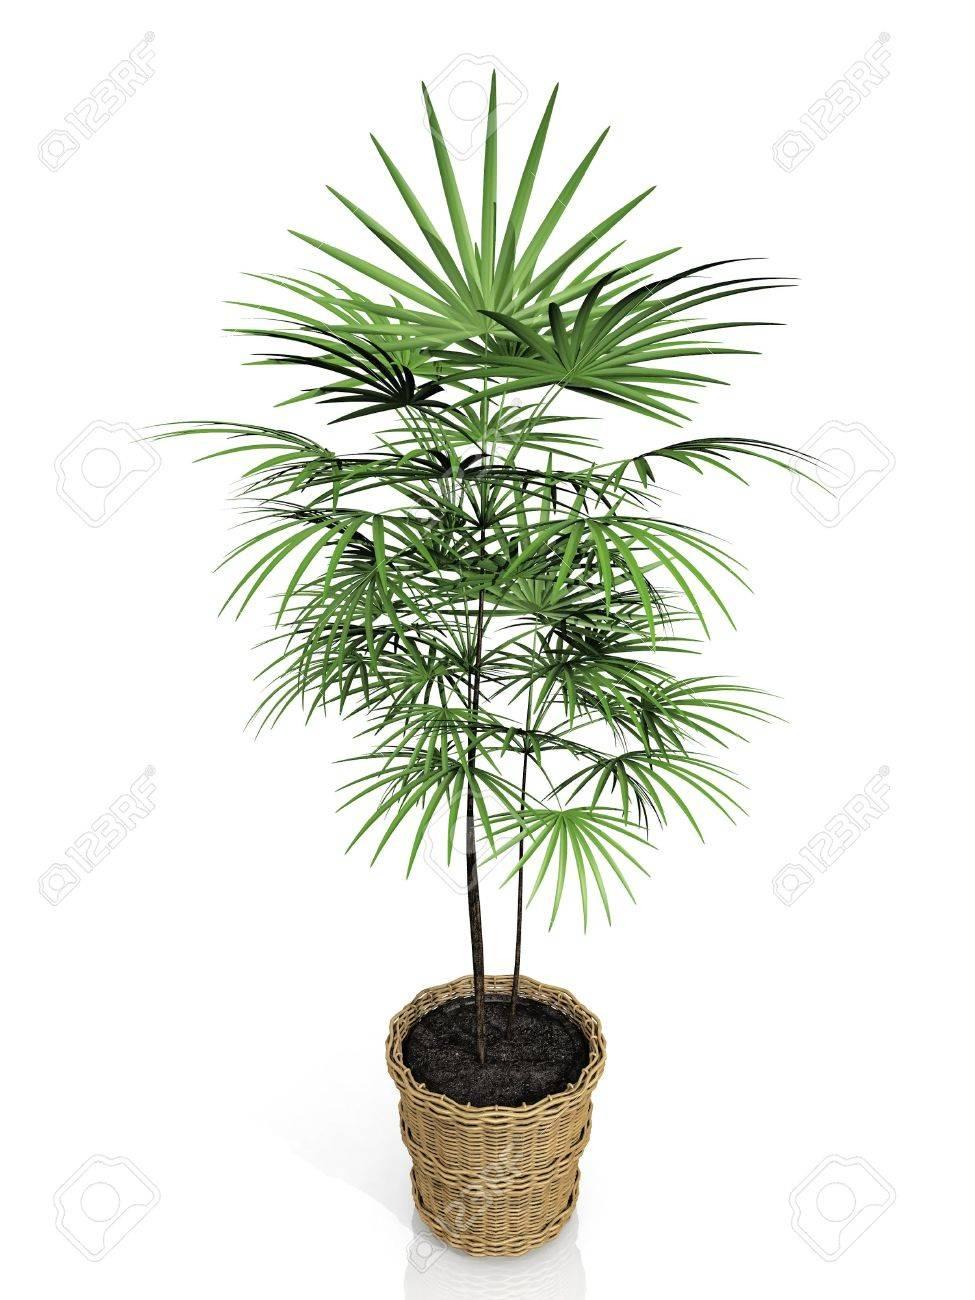 houseplants on white background - 10956953